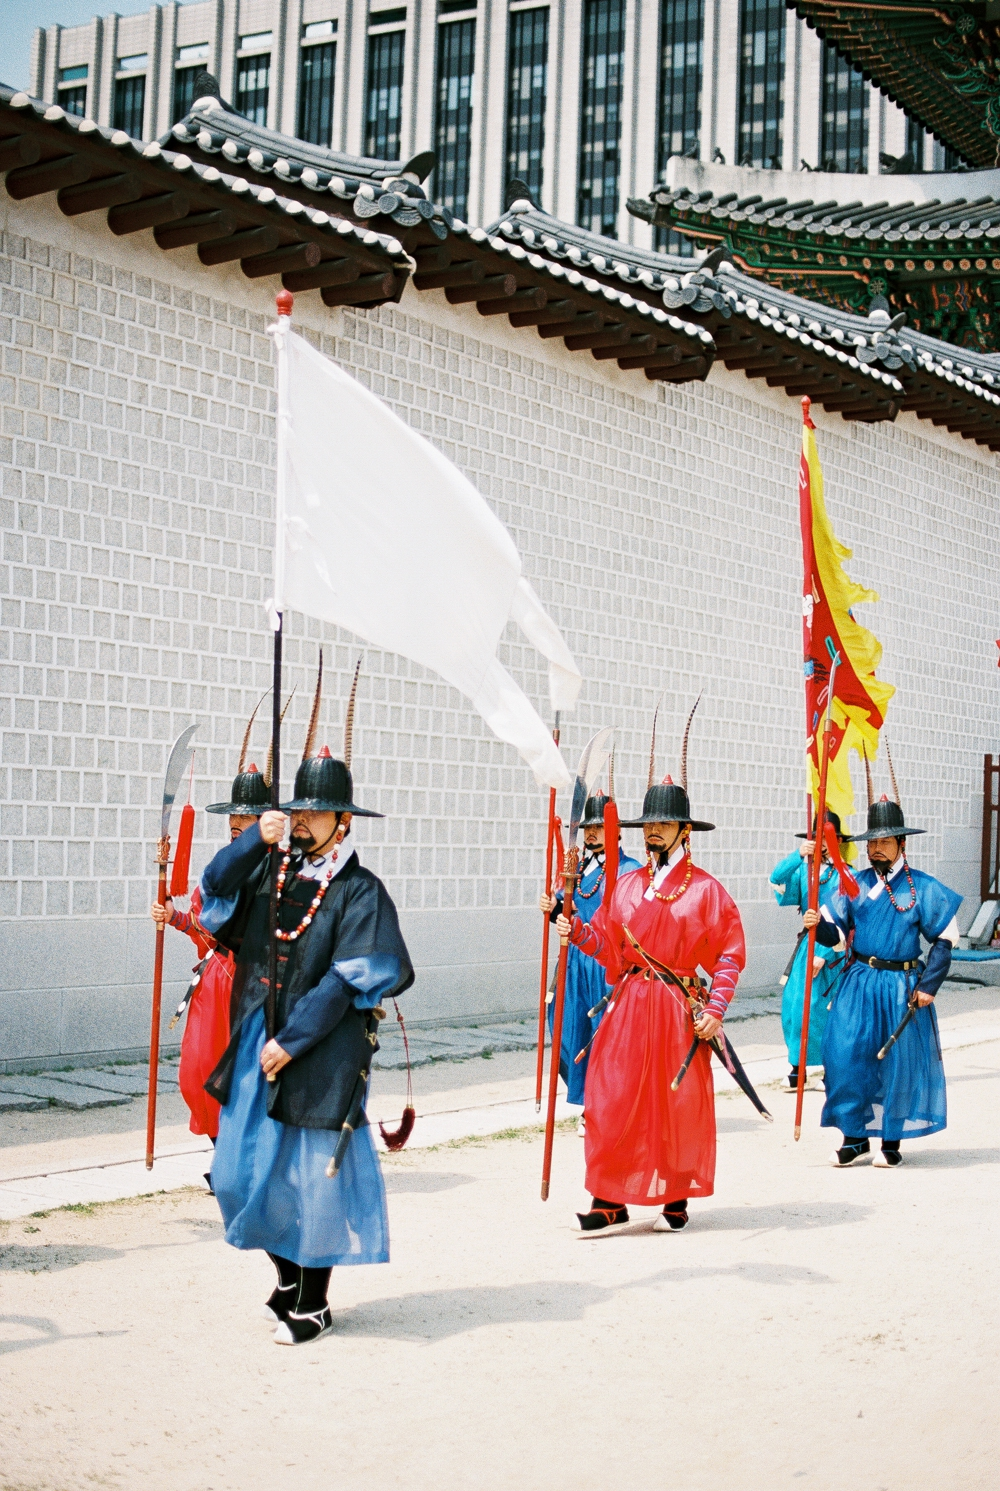 engagement seoul korea sydney ted czar goss photography collage 10.jpg